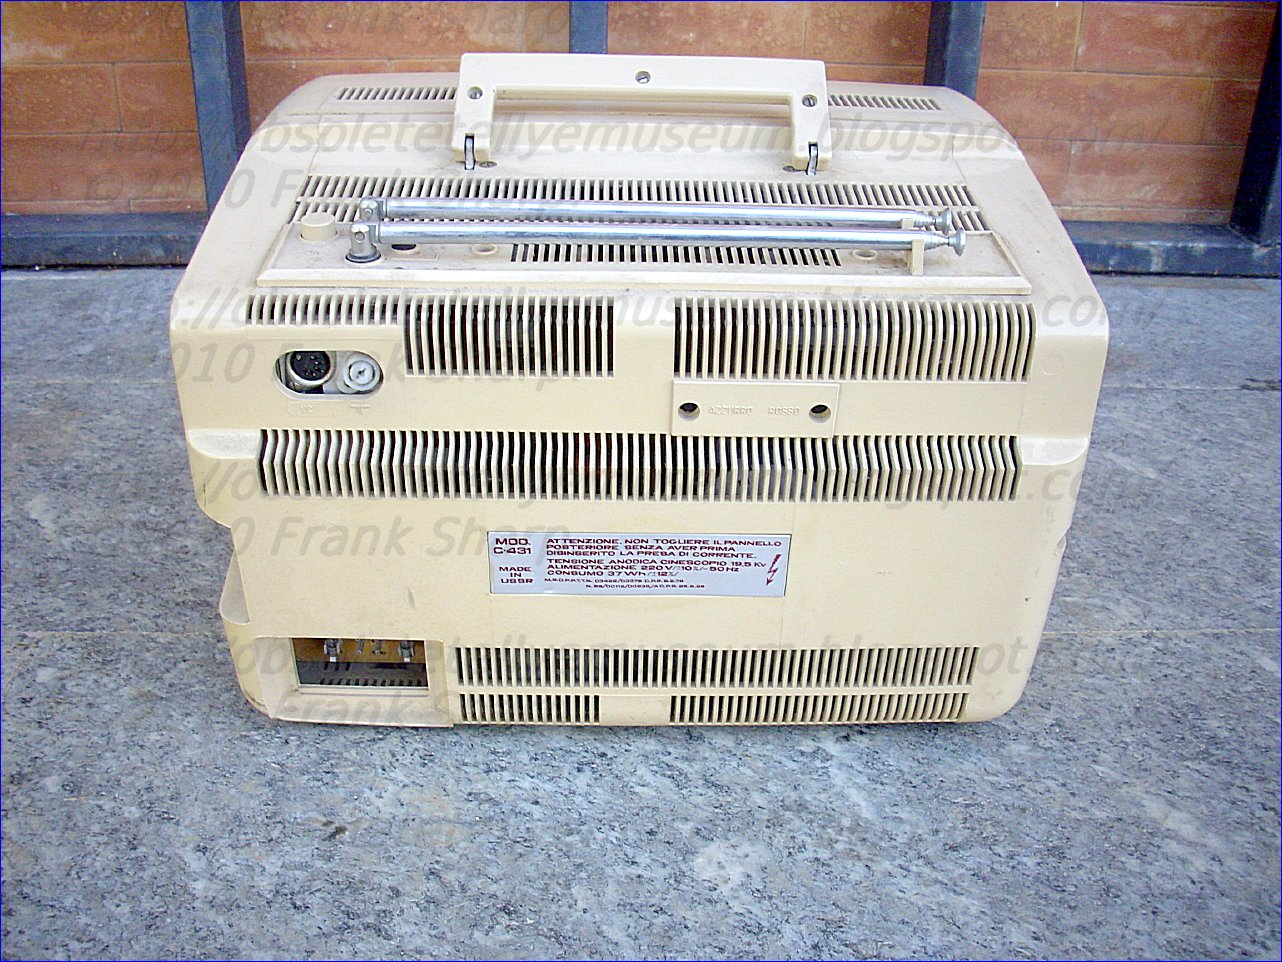 Obsolete Technology Tellye !: HYPER ELECTRONIC MOD. 431 YEAR 1986.